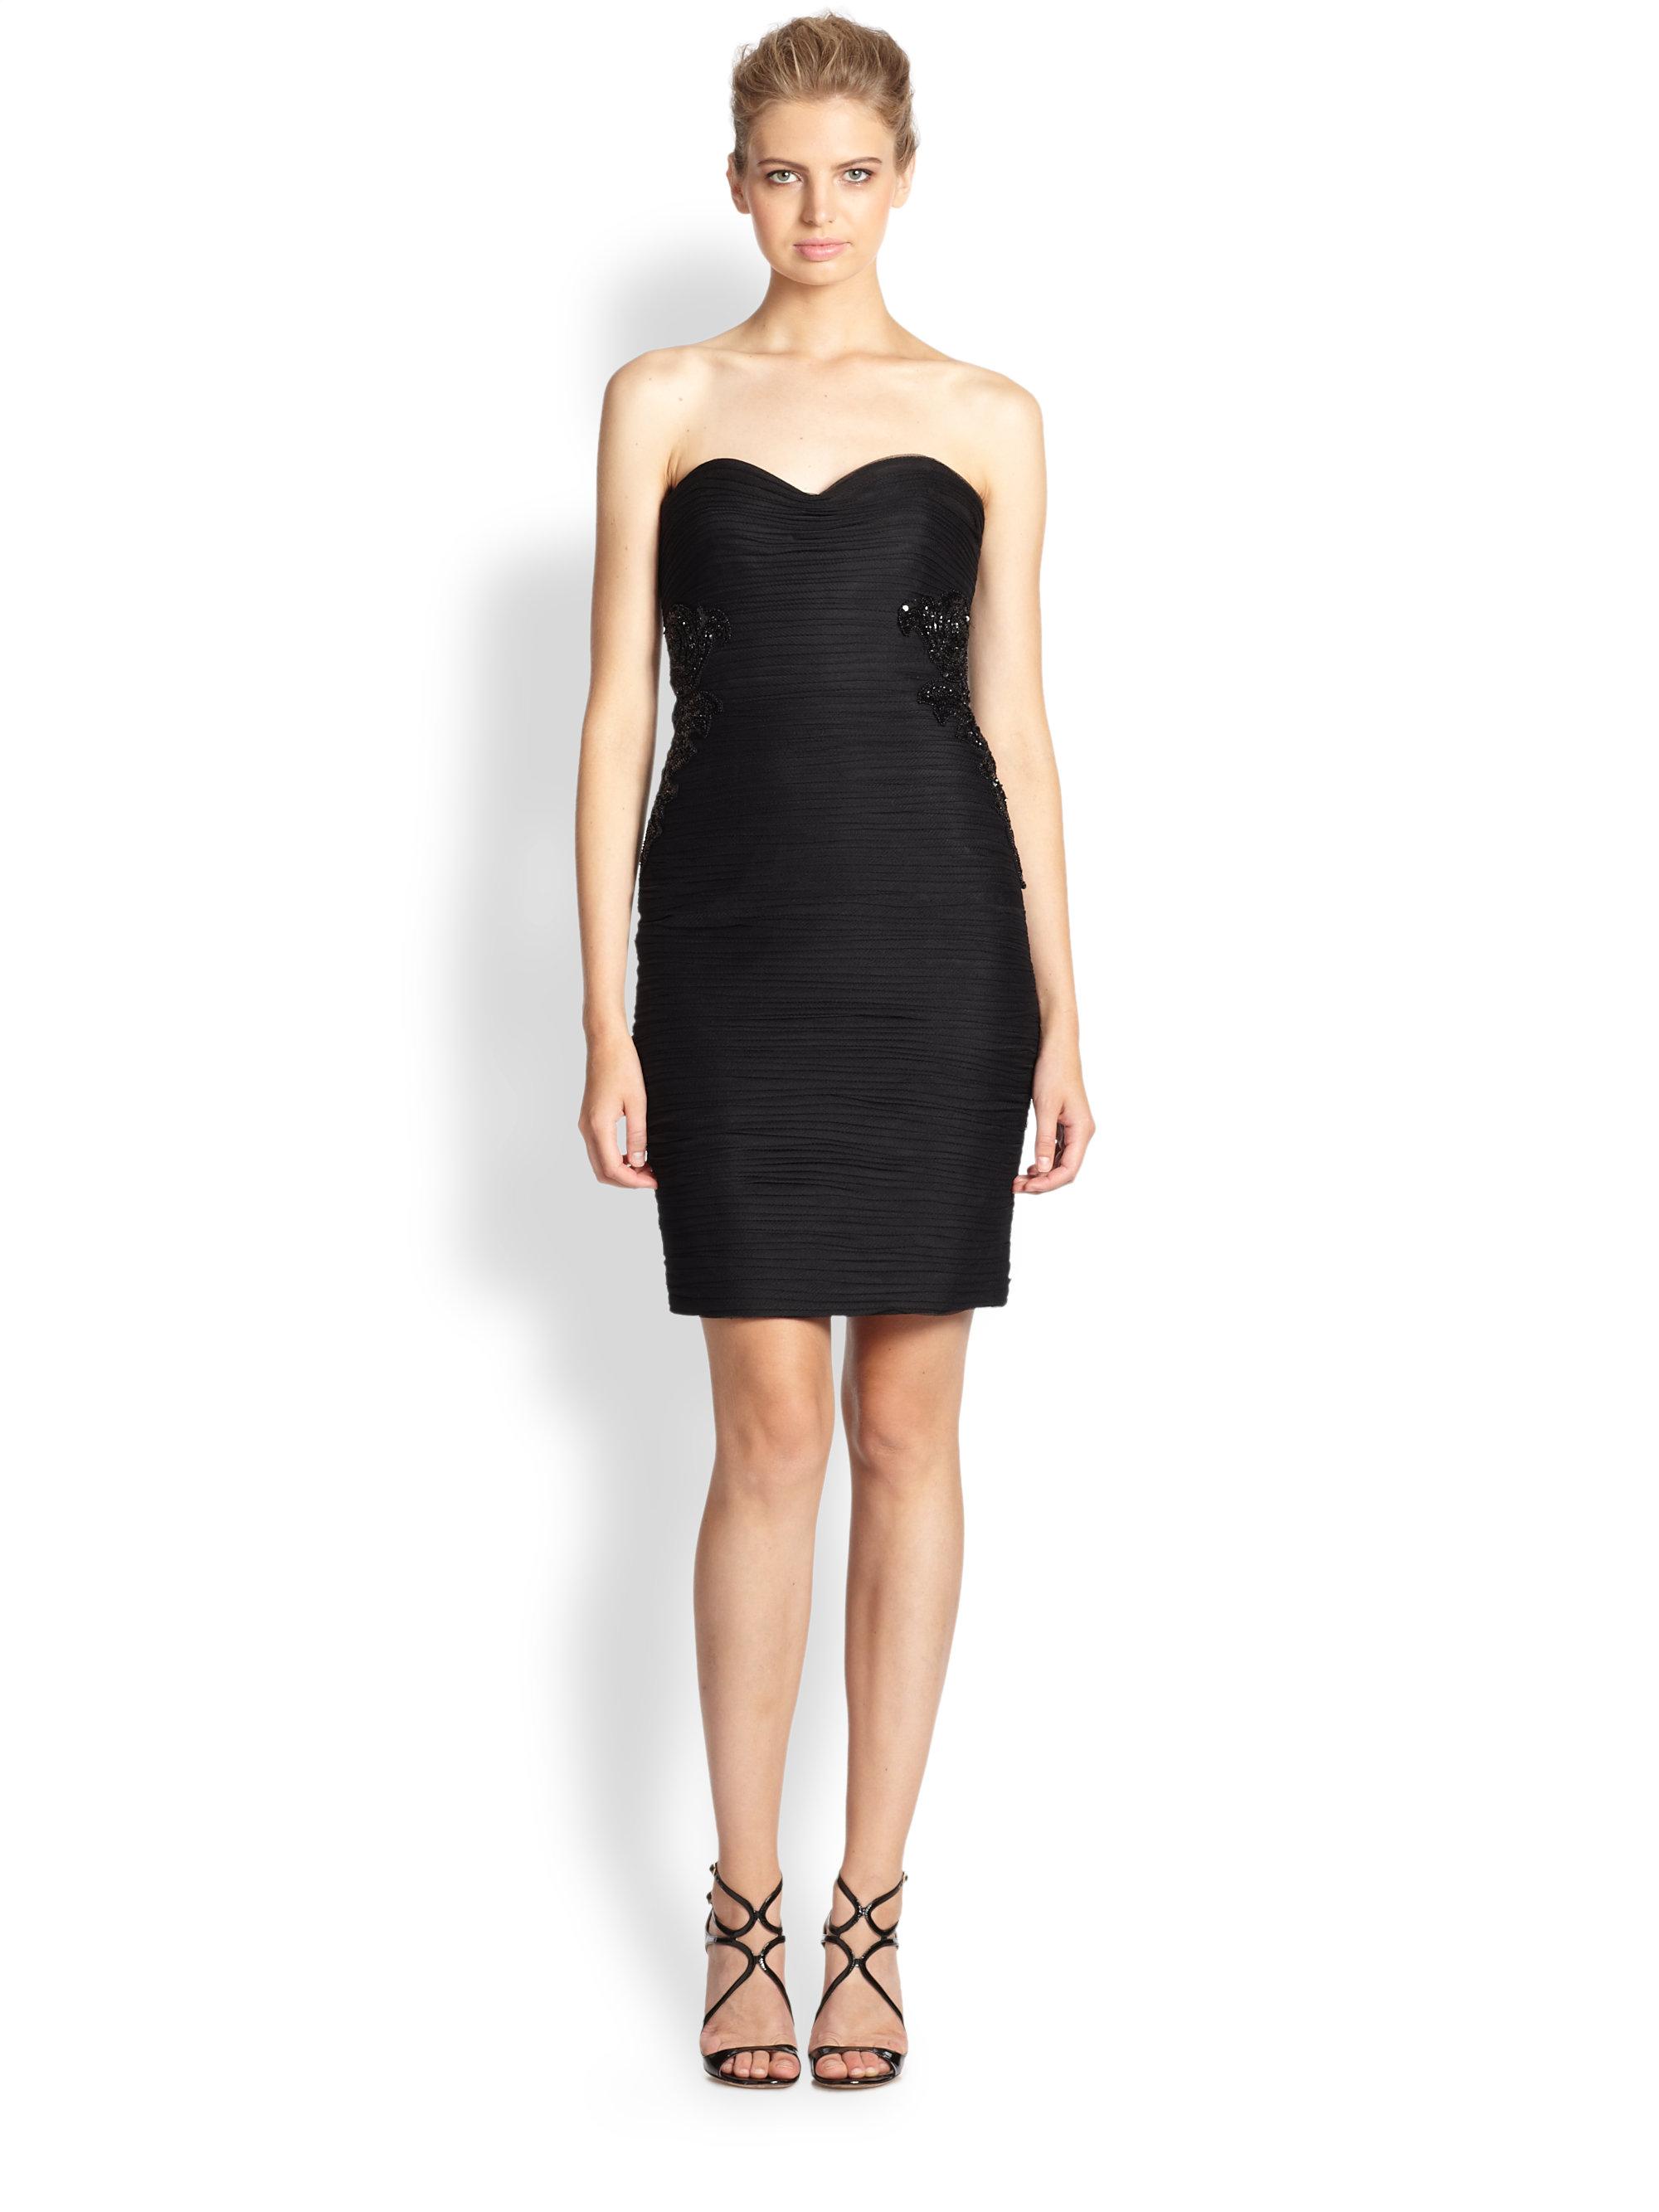 ML Monique Lhuillier Strapless Ruched Cocktail Dress in Black